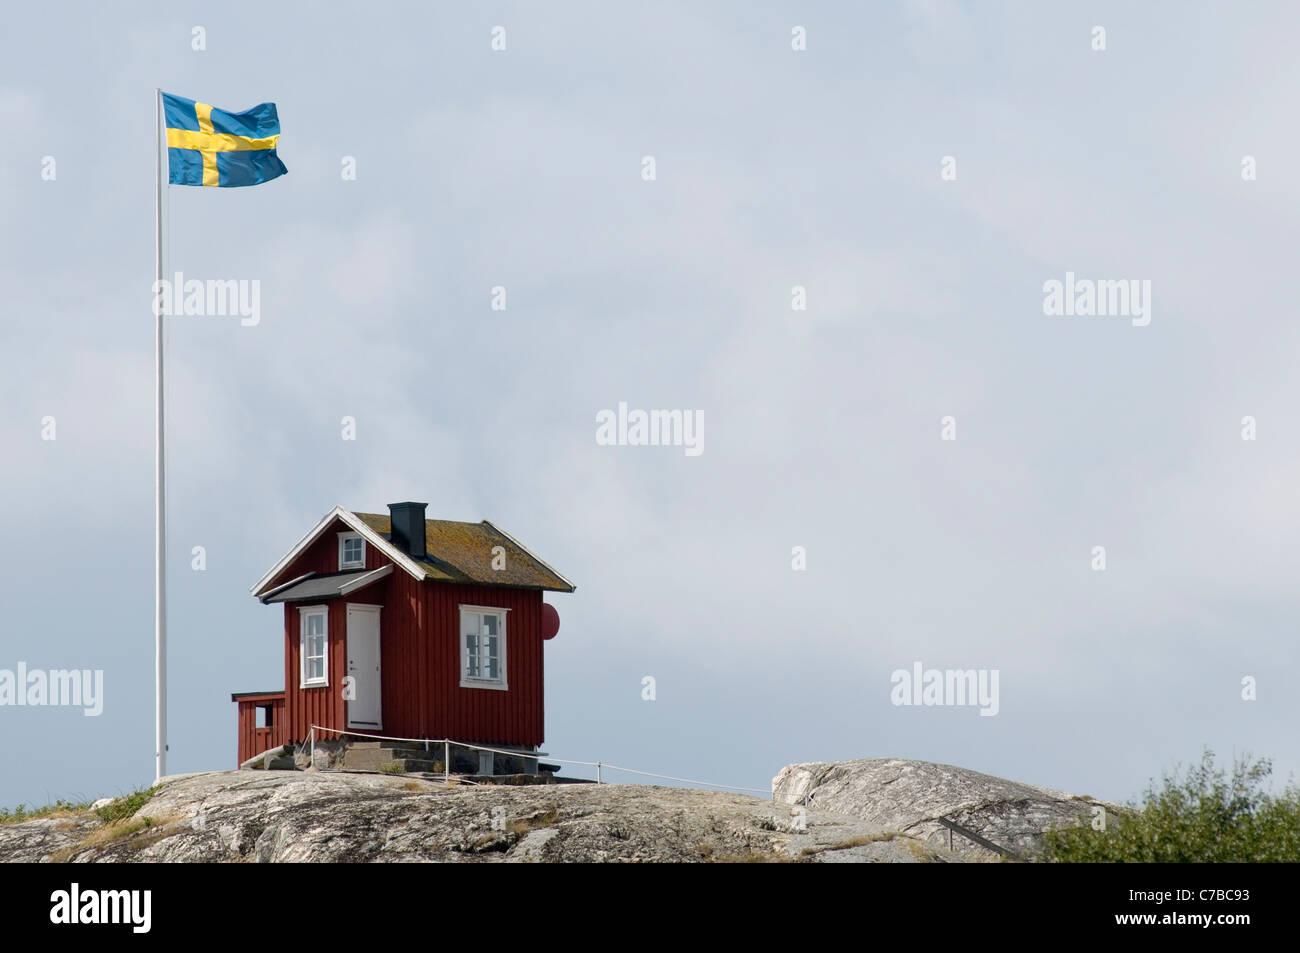 archipel inselgruppen g teborg g teborg roten schwedenhaus kleine h tte falun farbe flagge. Black Bedroom Furniture Sets. Home Design Ideas